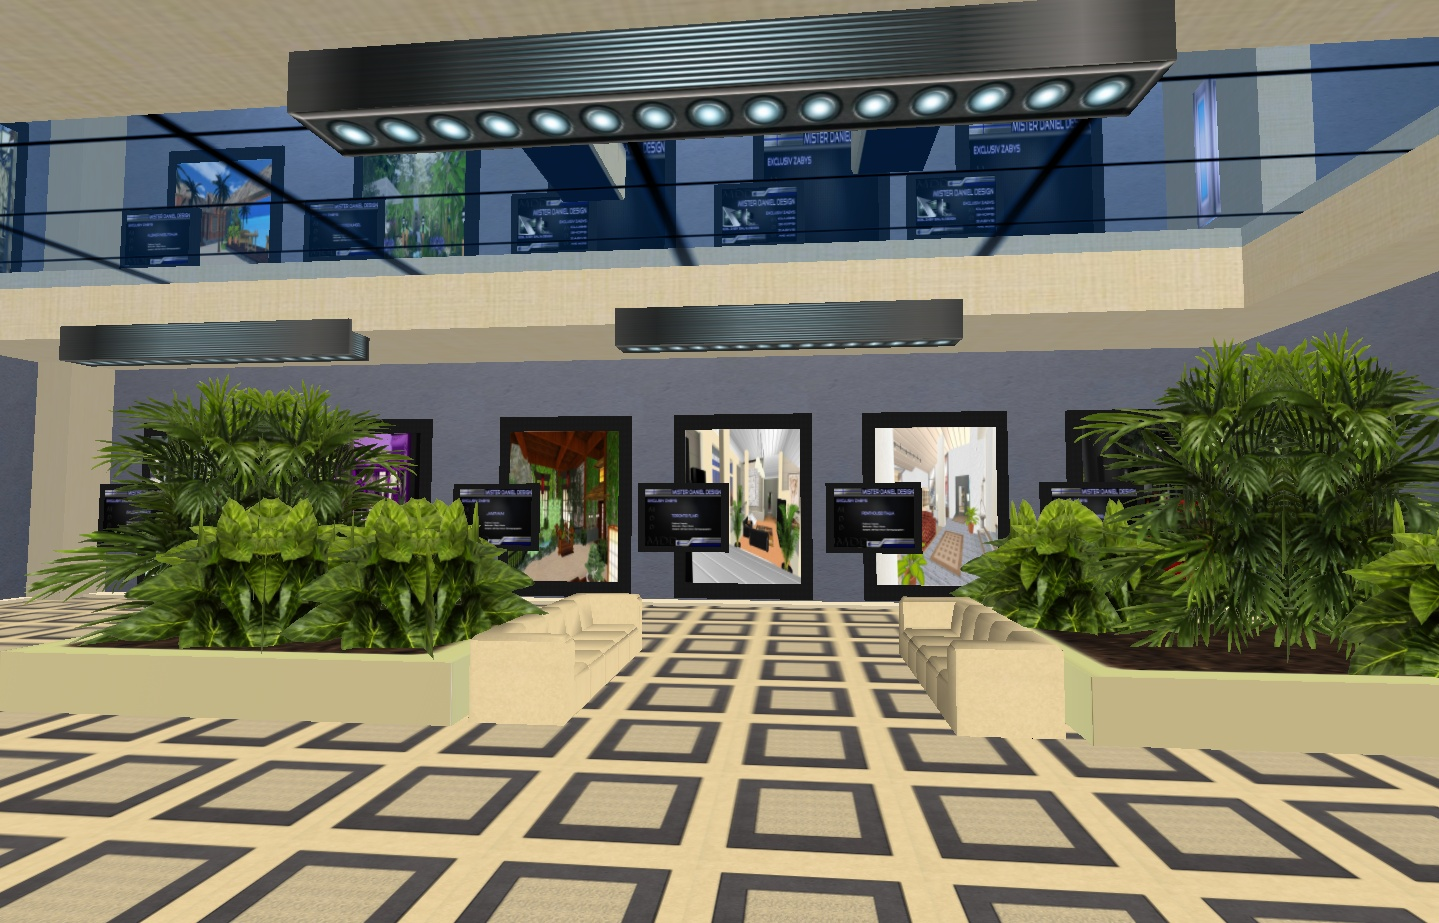 Das neue Palais de Création 2